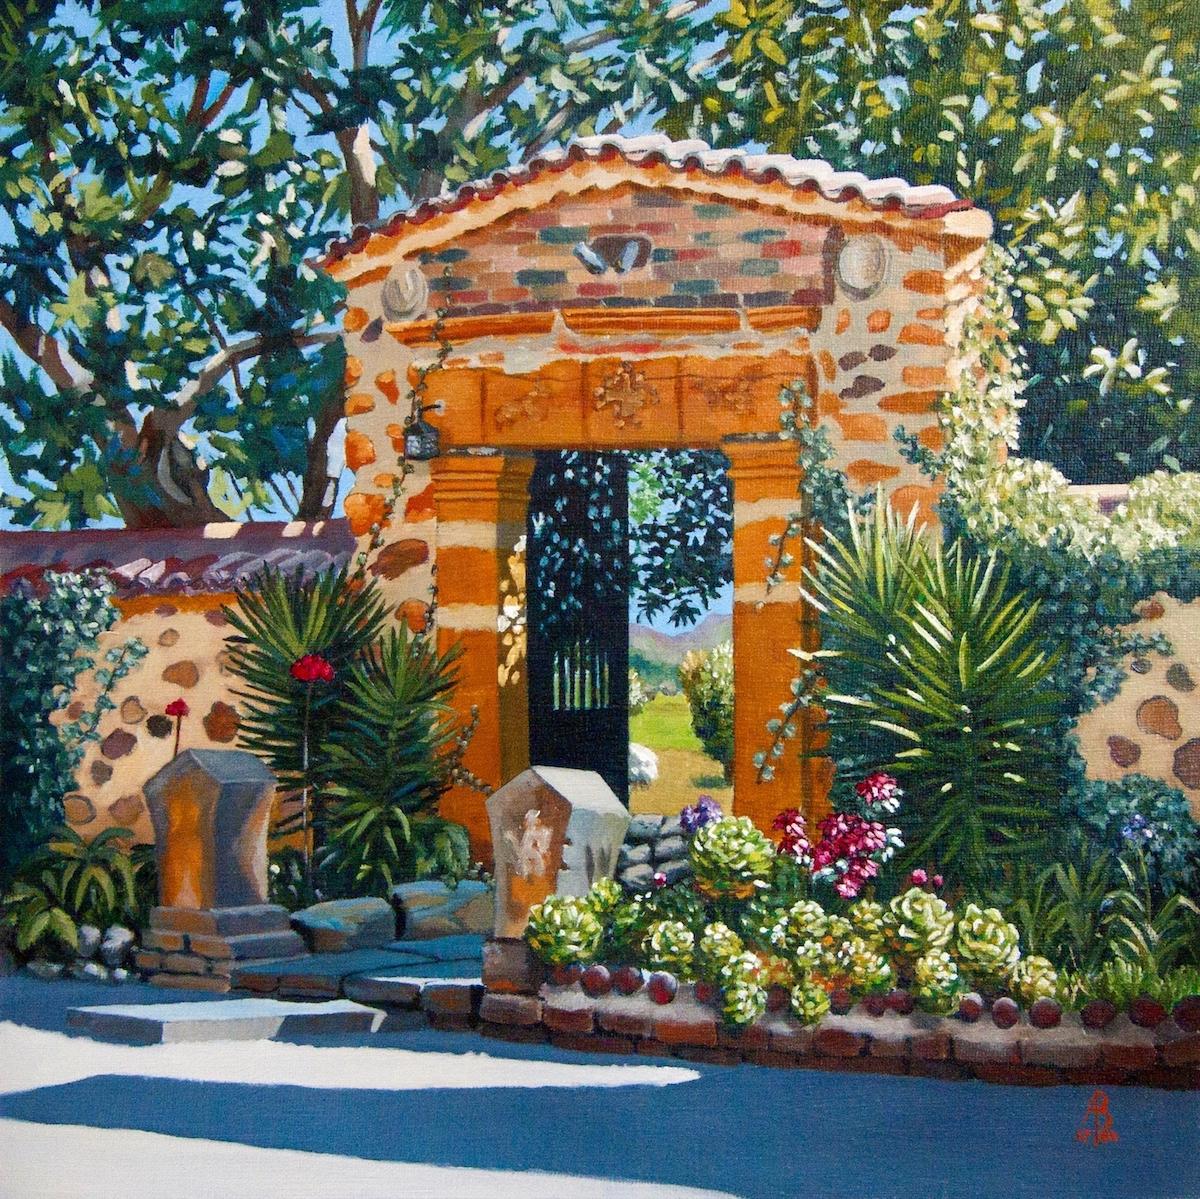 Alix Baker, To a Monastery Garden, Colombia, Oil, 40 x 40 x 0.5,  http://www.alixbaker.com